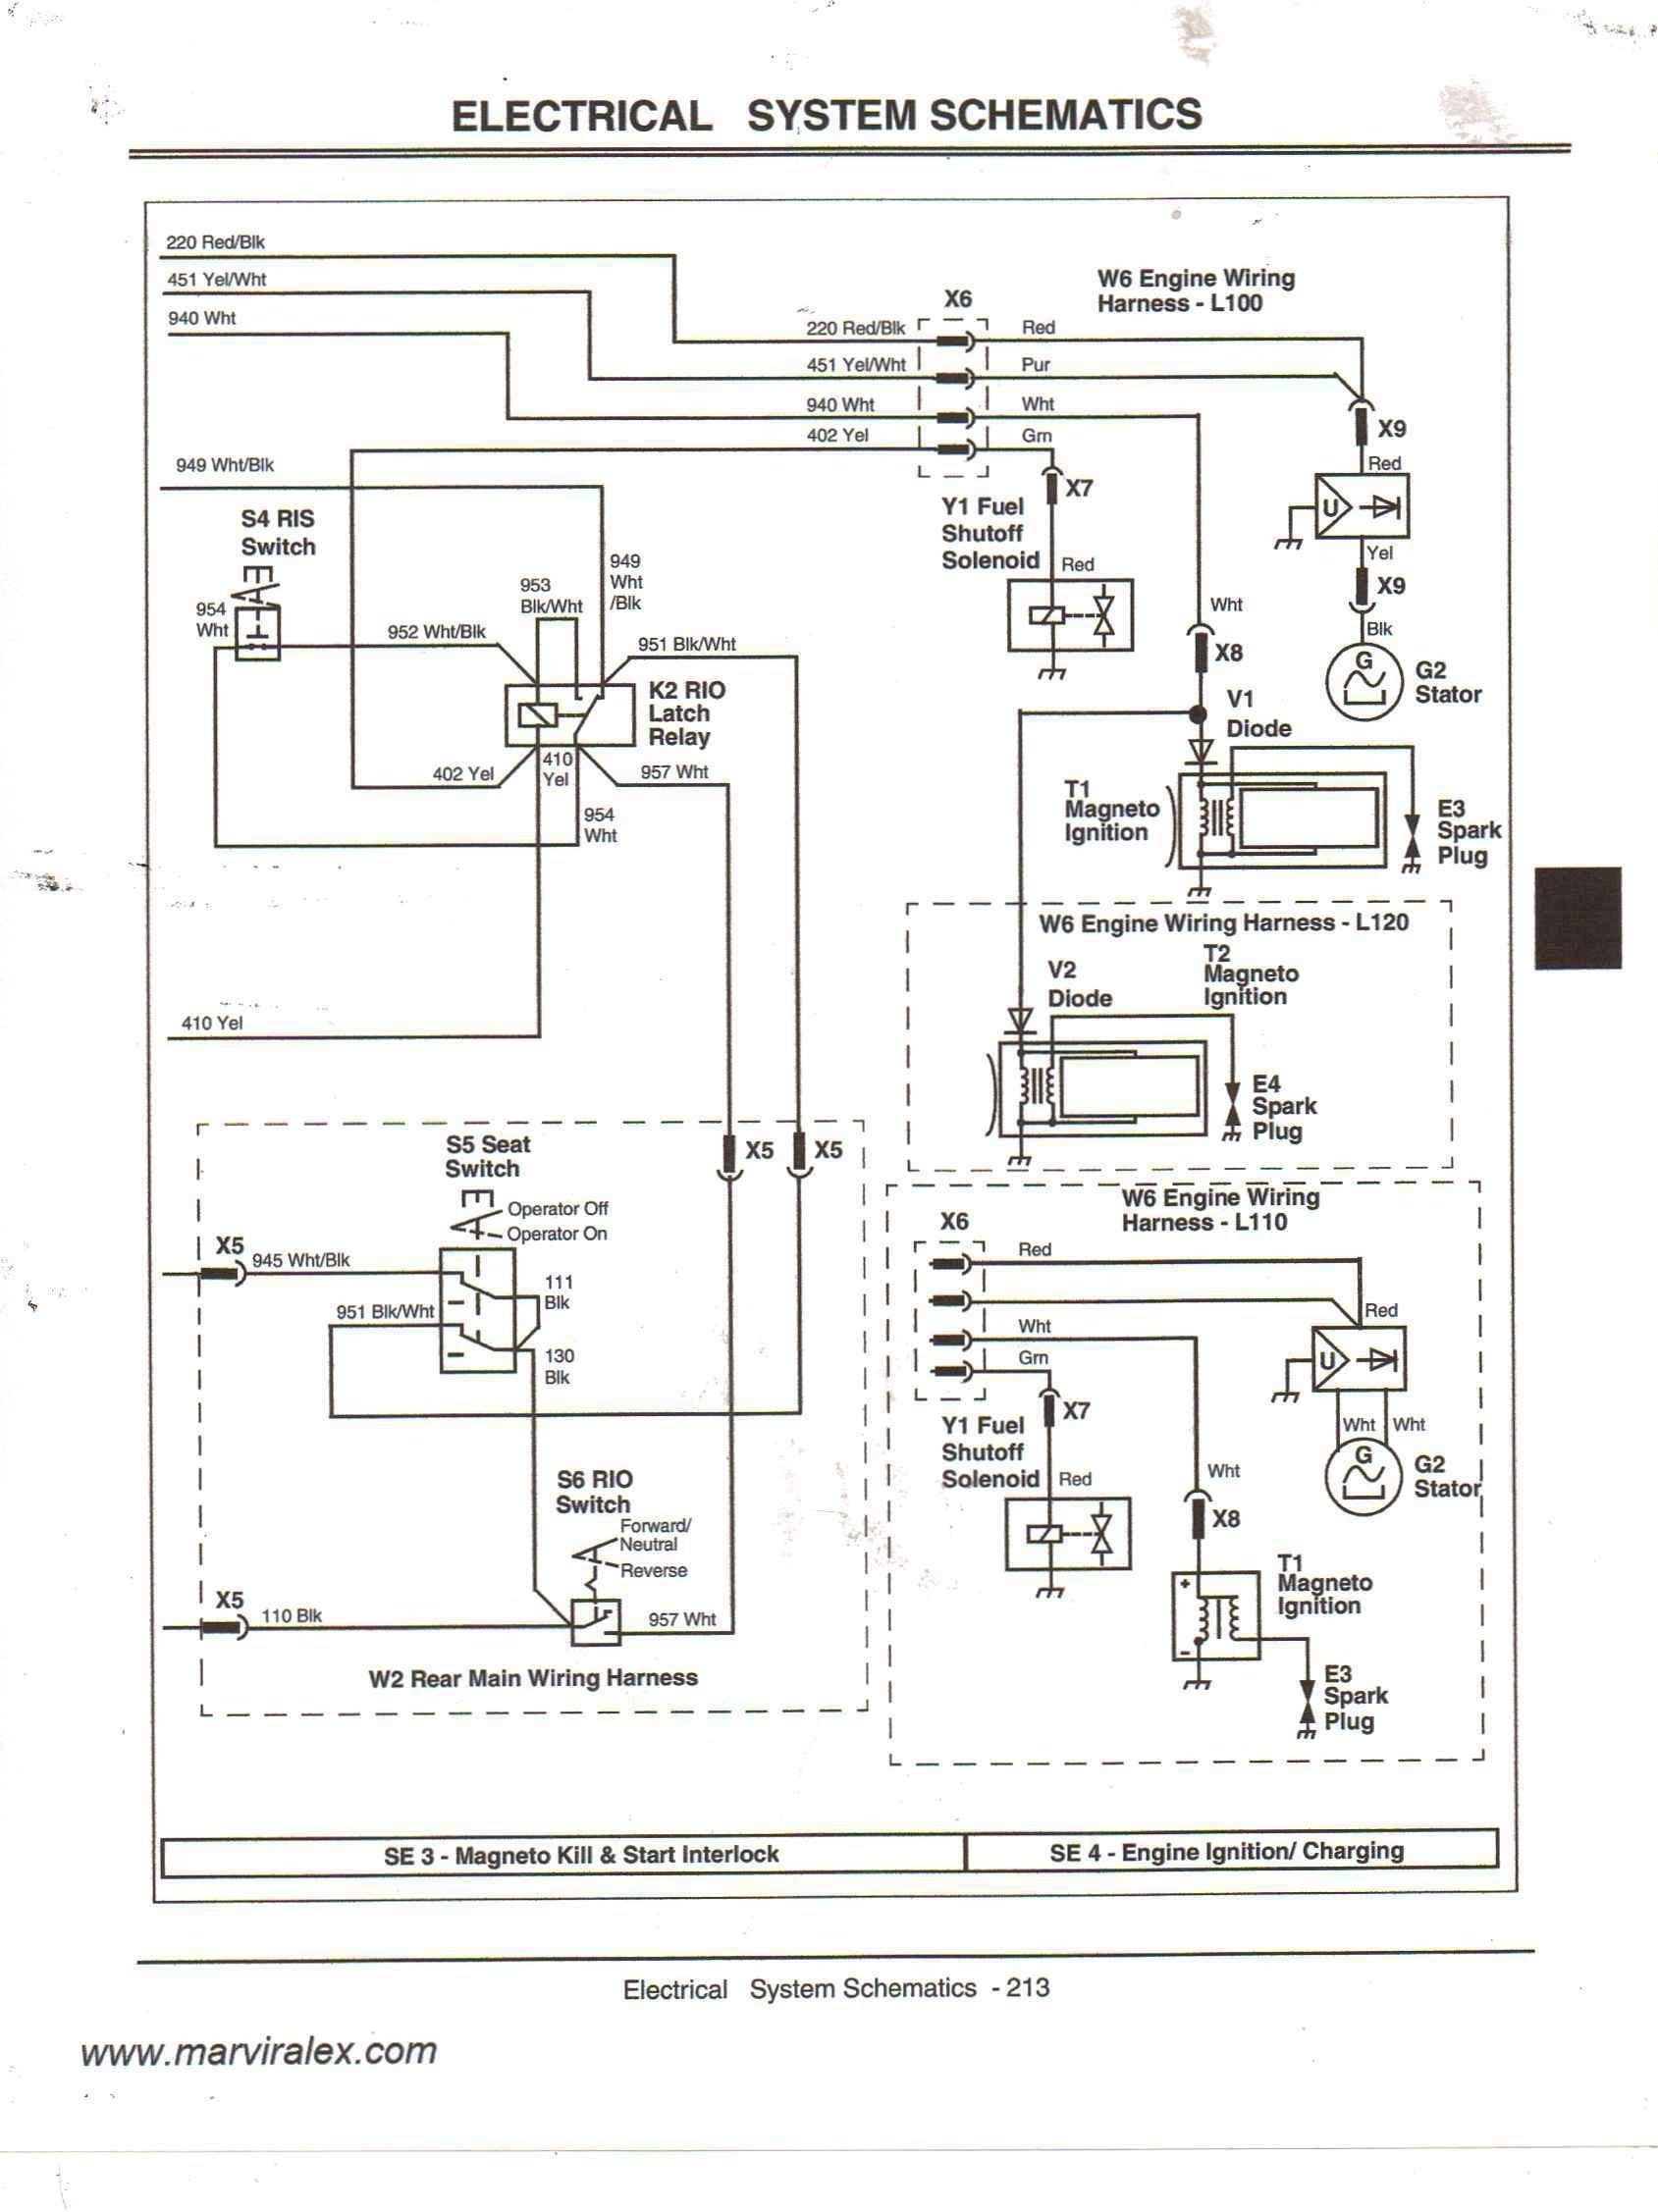 John Deere Lt150 Wiring Diagram Tc 7708] Yard Machine Engine Diagram Free Download Wiring Of John Deere Lt150 Wiring Diagram